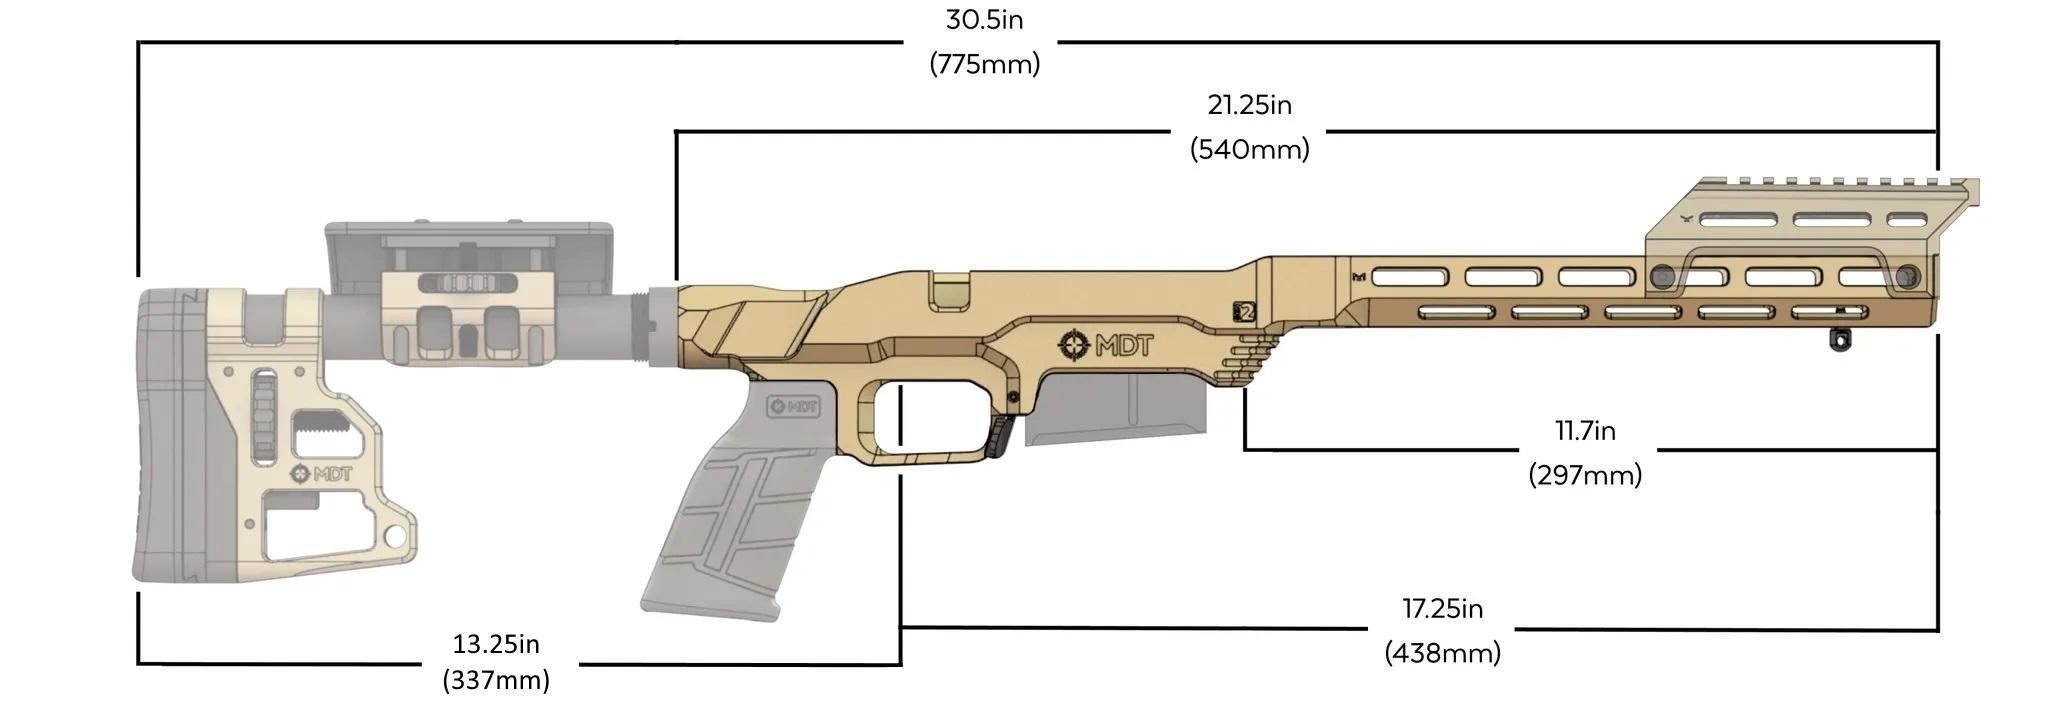 MDT LSS XL - CARBINE MOUNT aresmaxima.com